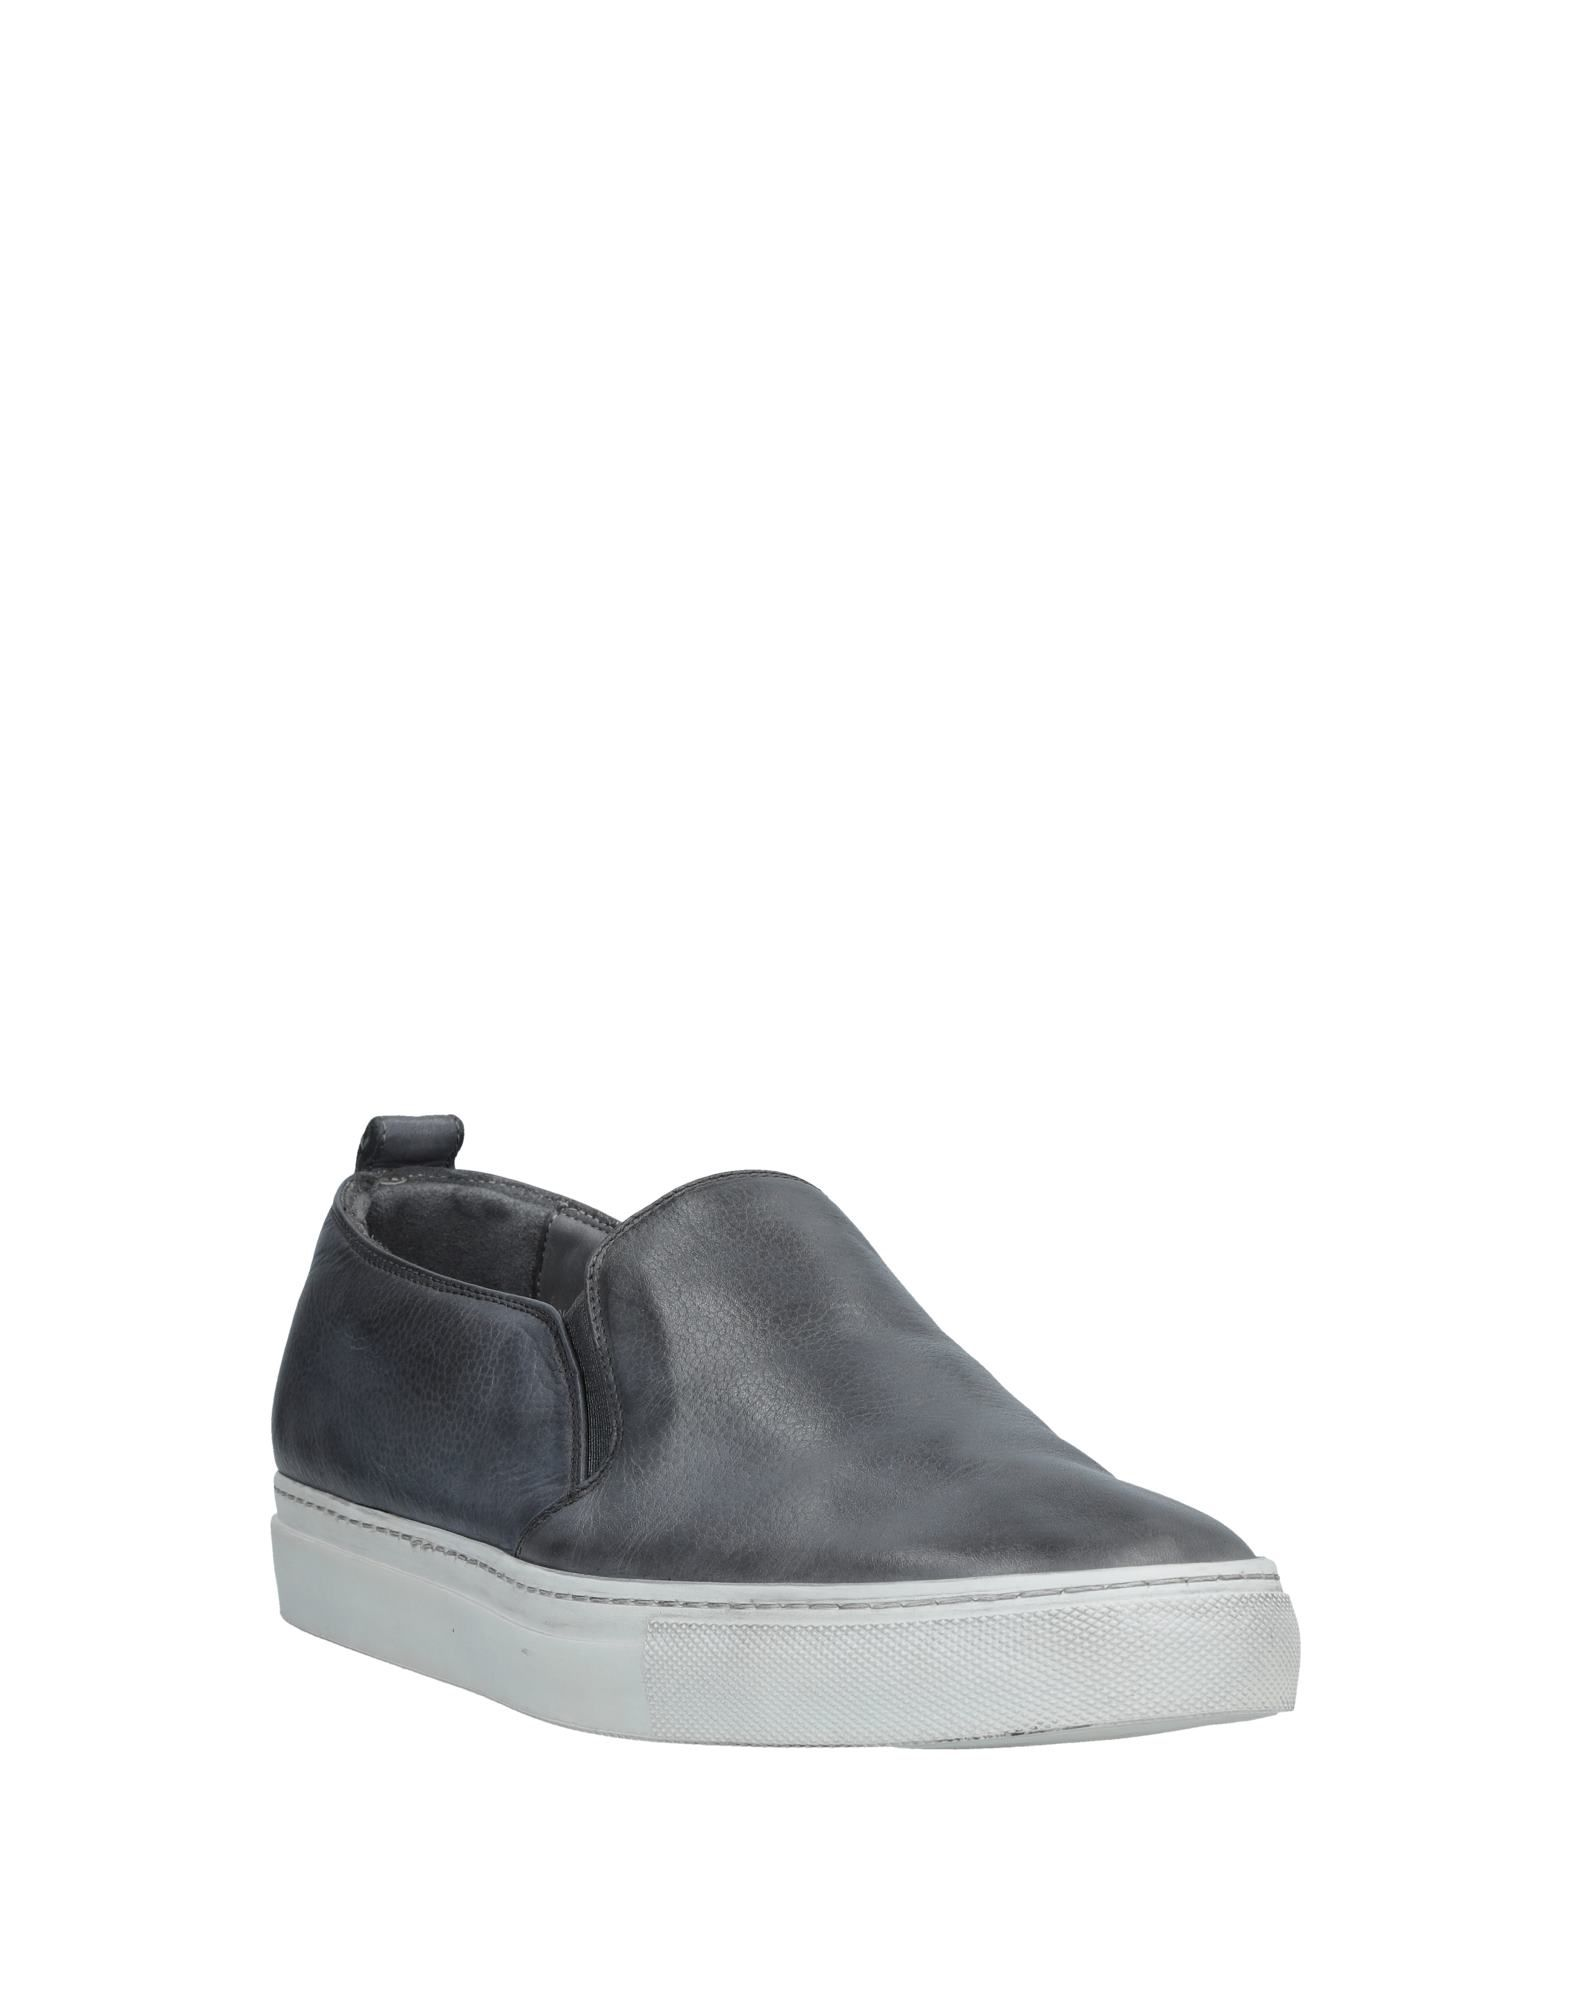 Raparo Sneakers Gute Herren  11537047LR Gute Sneakers Qualität beliebte Schuhe cc7b96